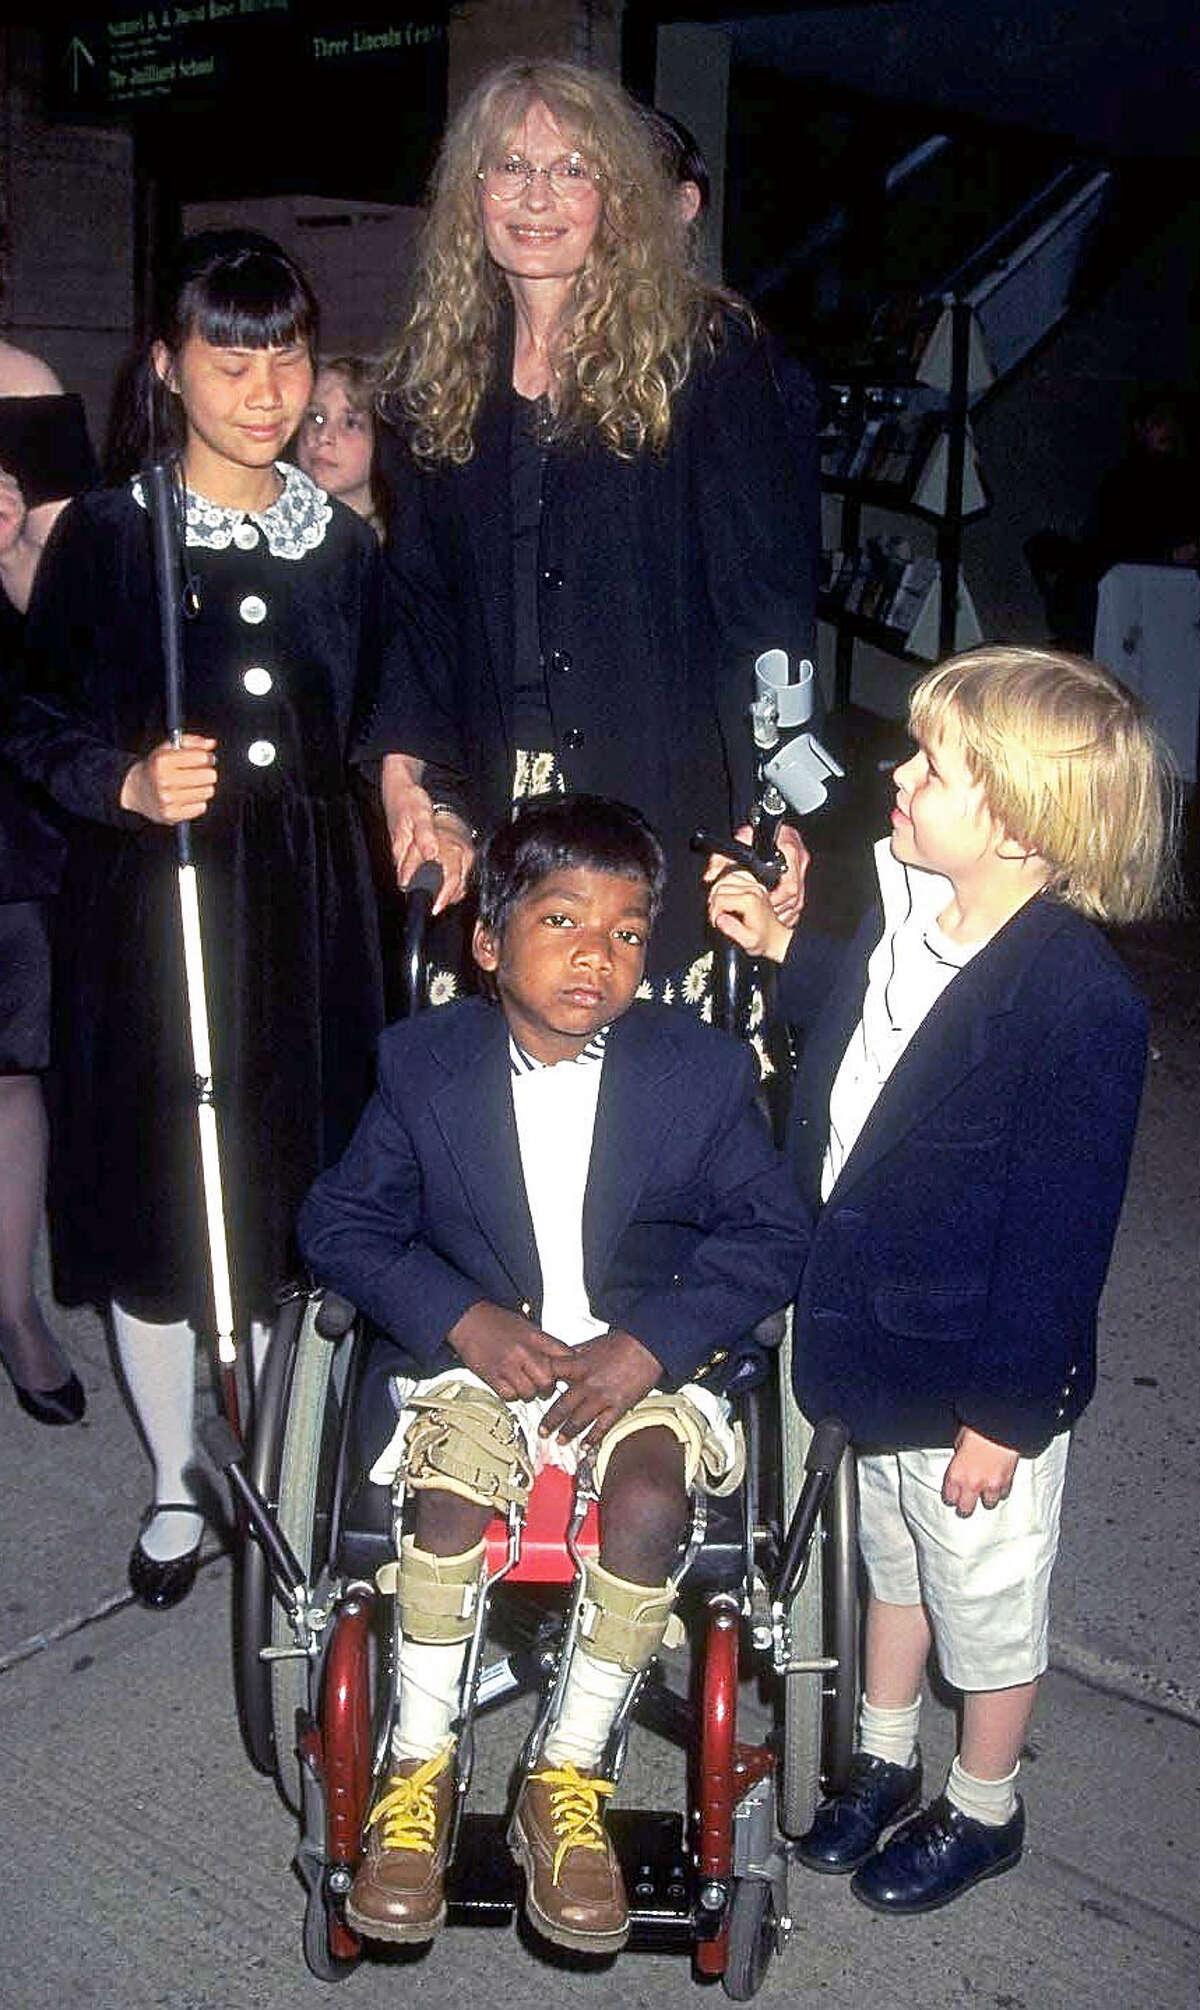 Actress Mia Farrow and her children, including Thaddeus, center.